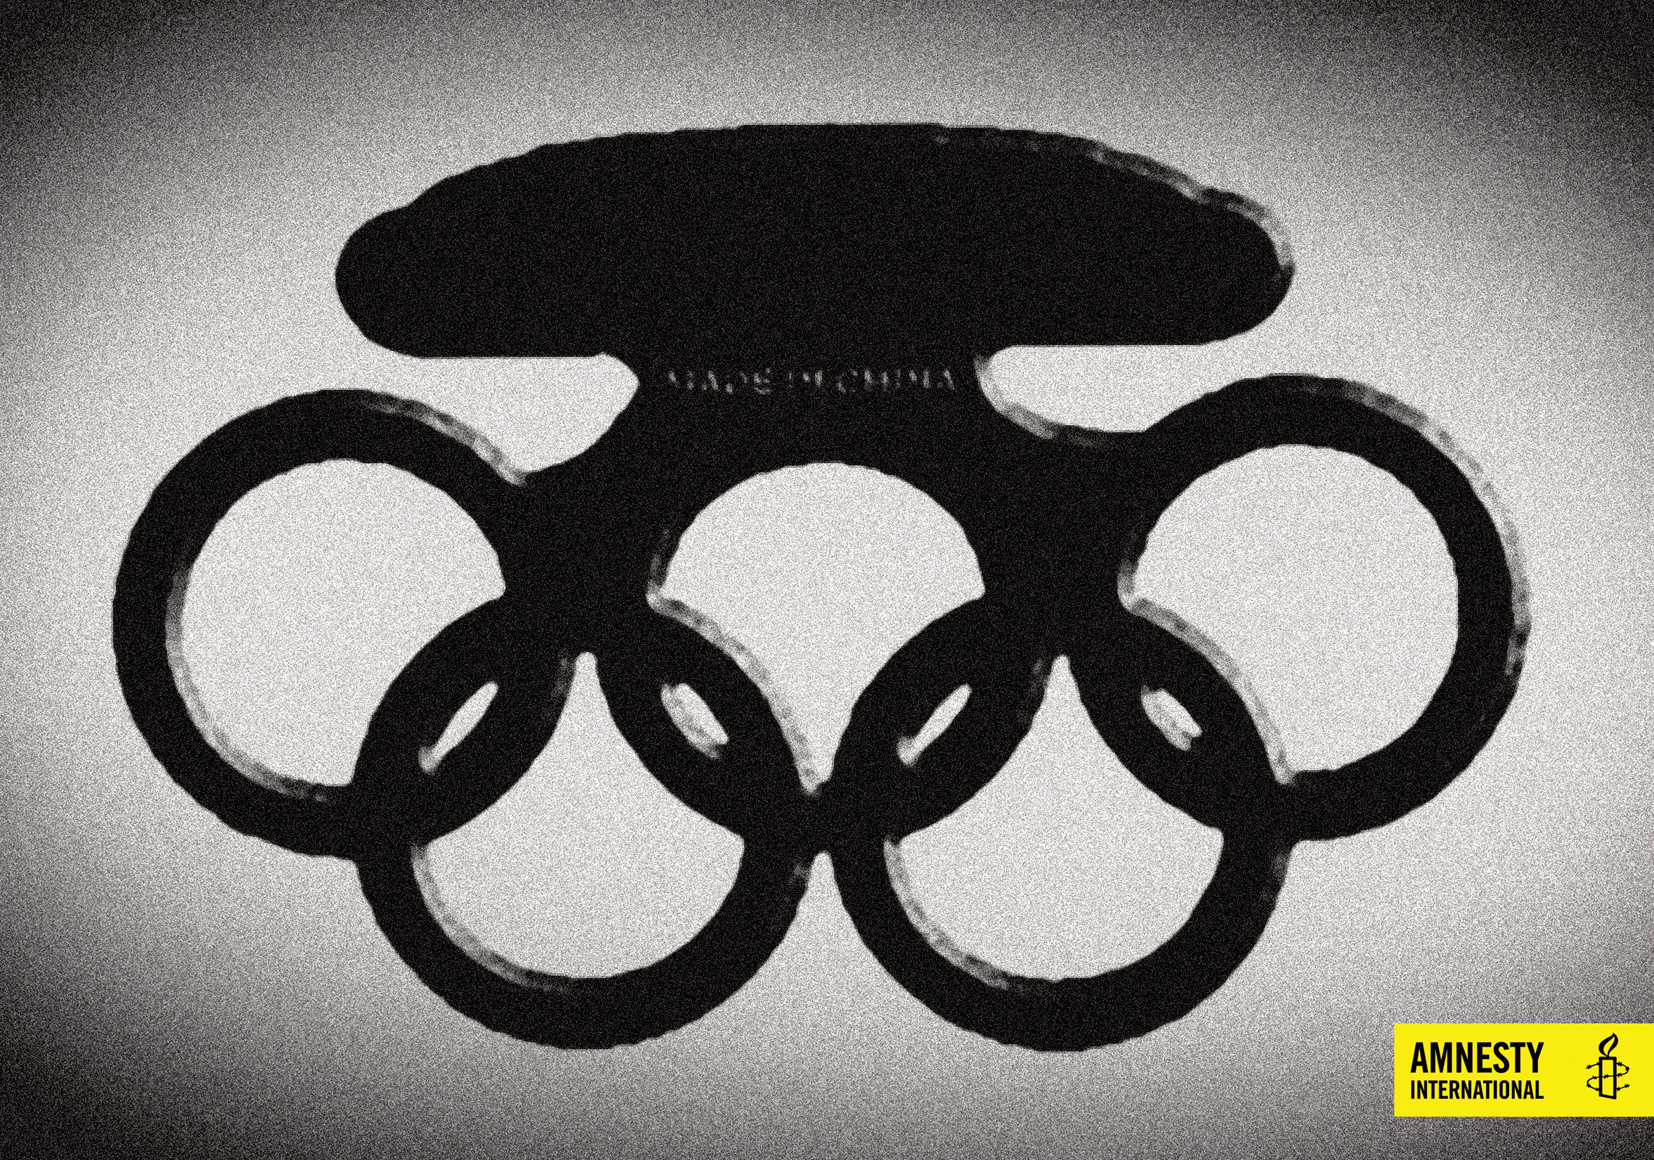 Beijing / Amnesty International